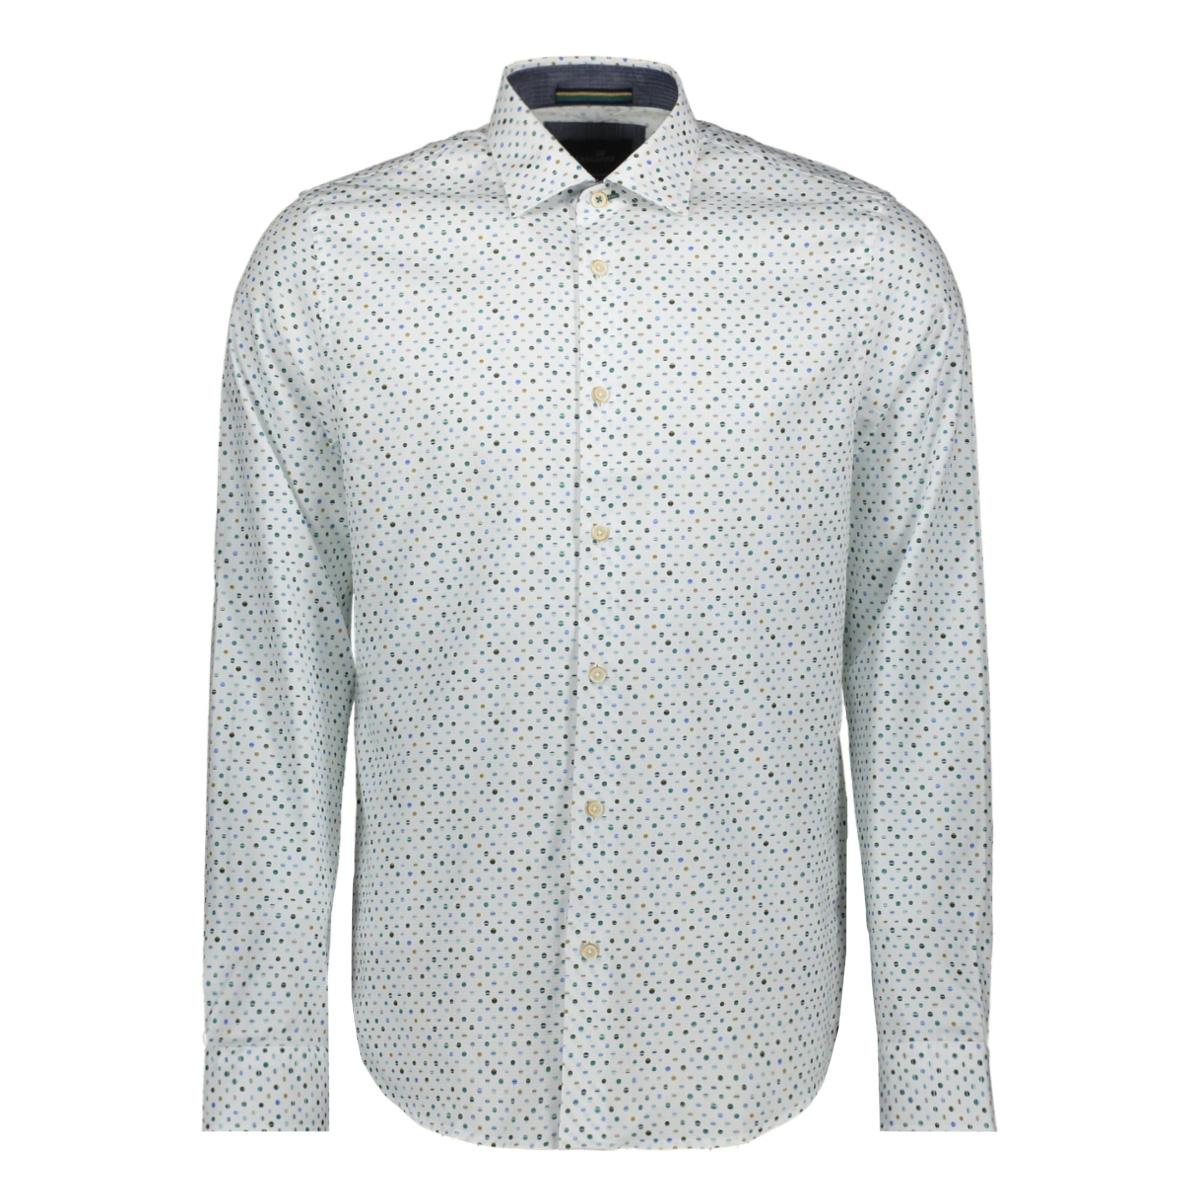 long sleeve poplin print shirt vsi196402 vanguard overhemd 7003